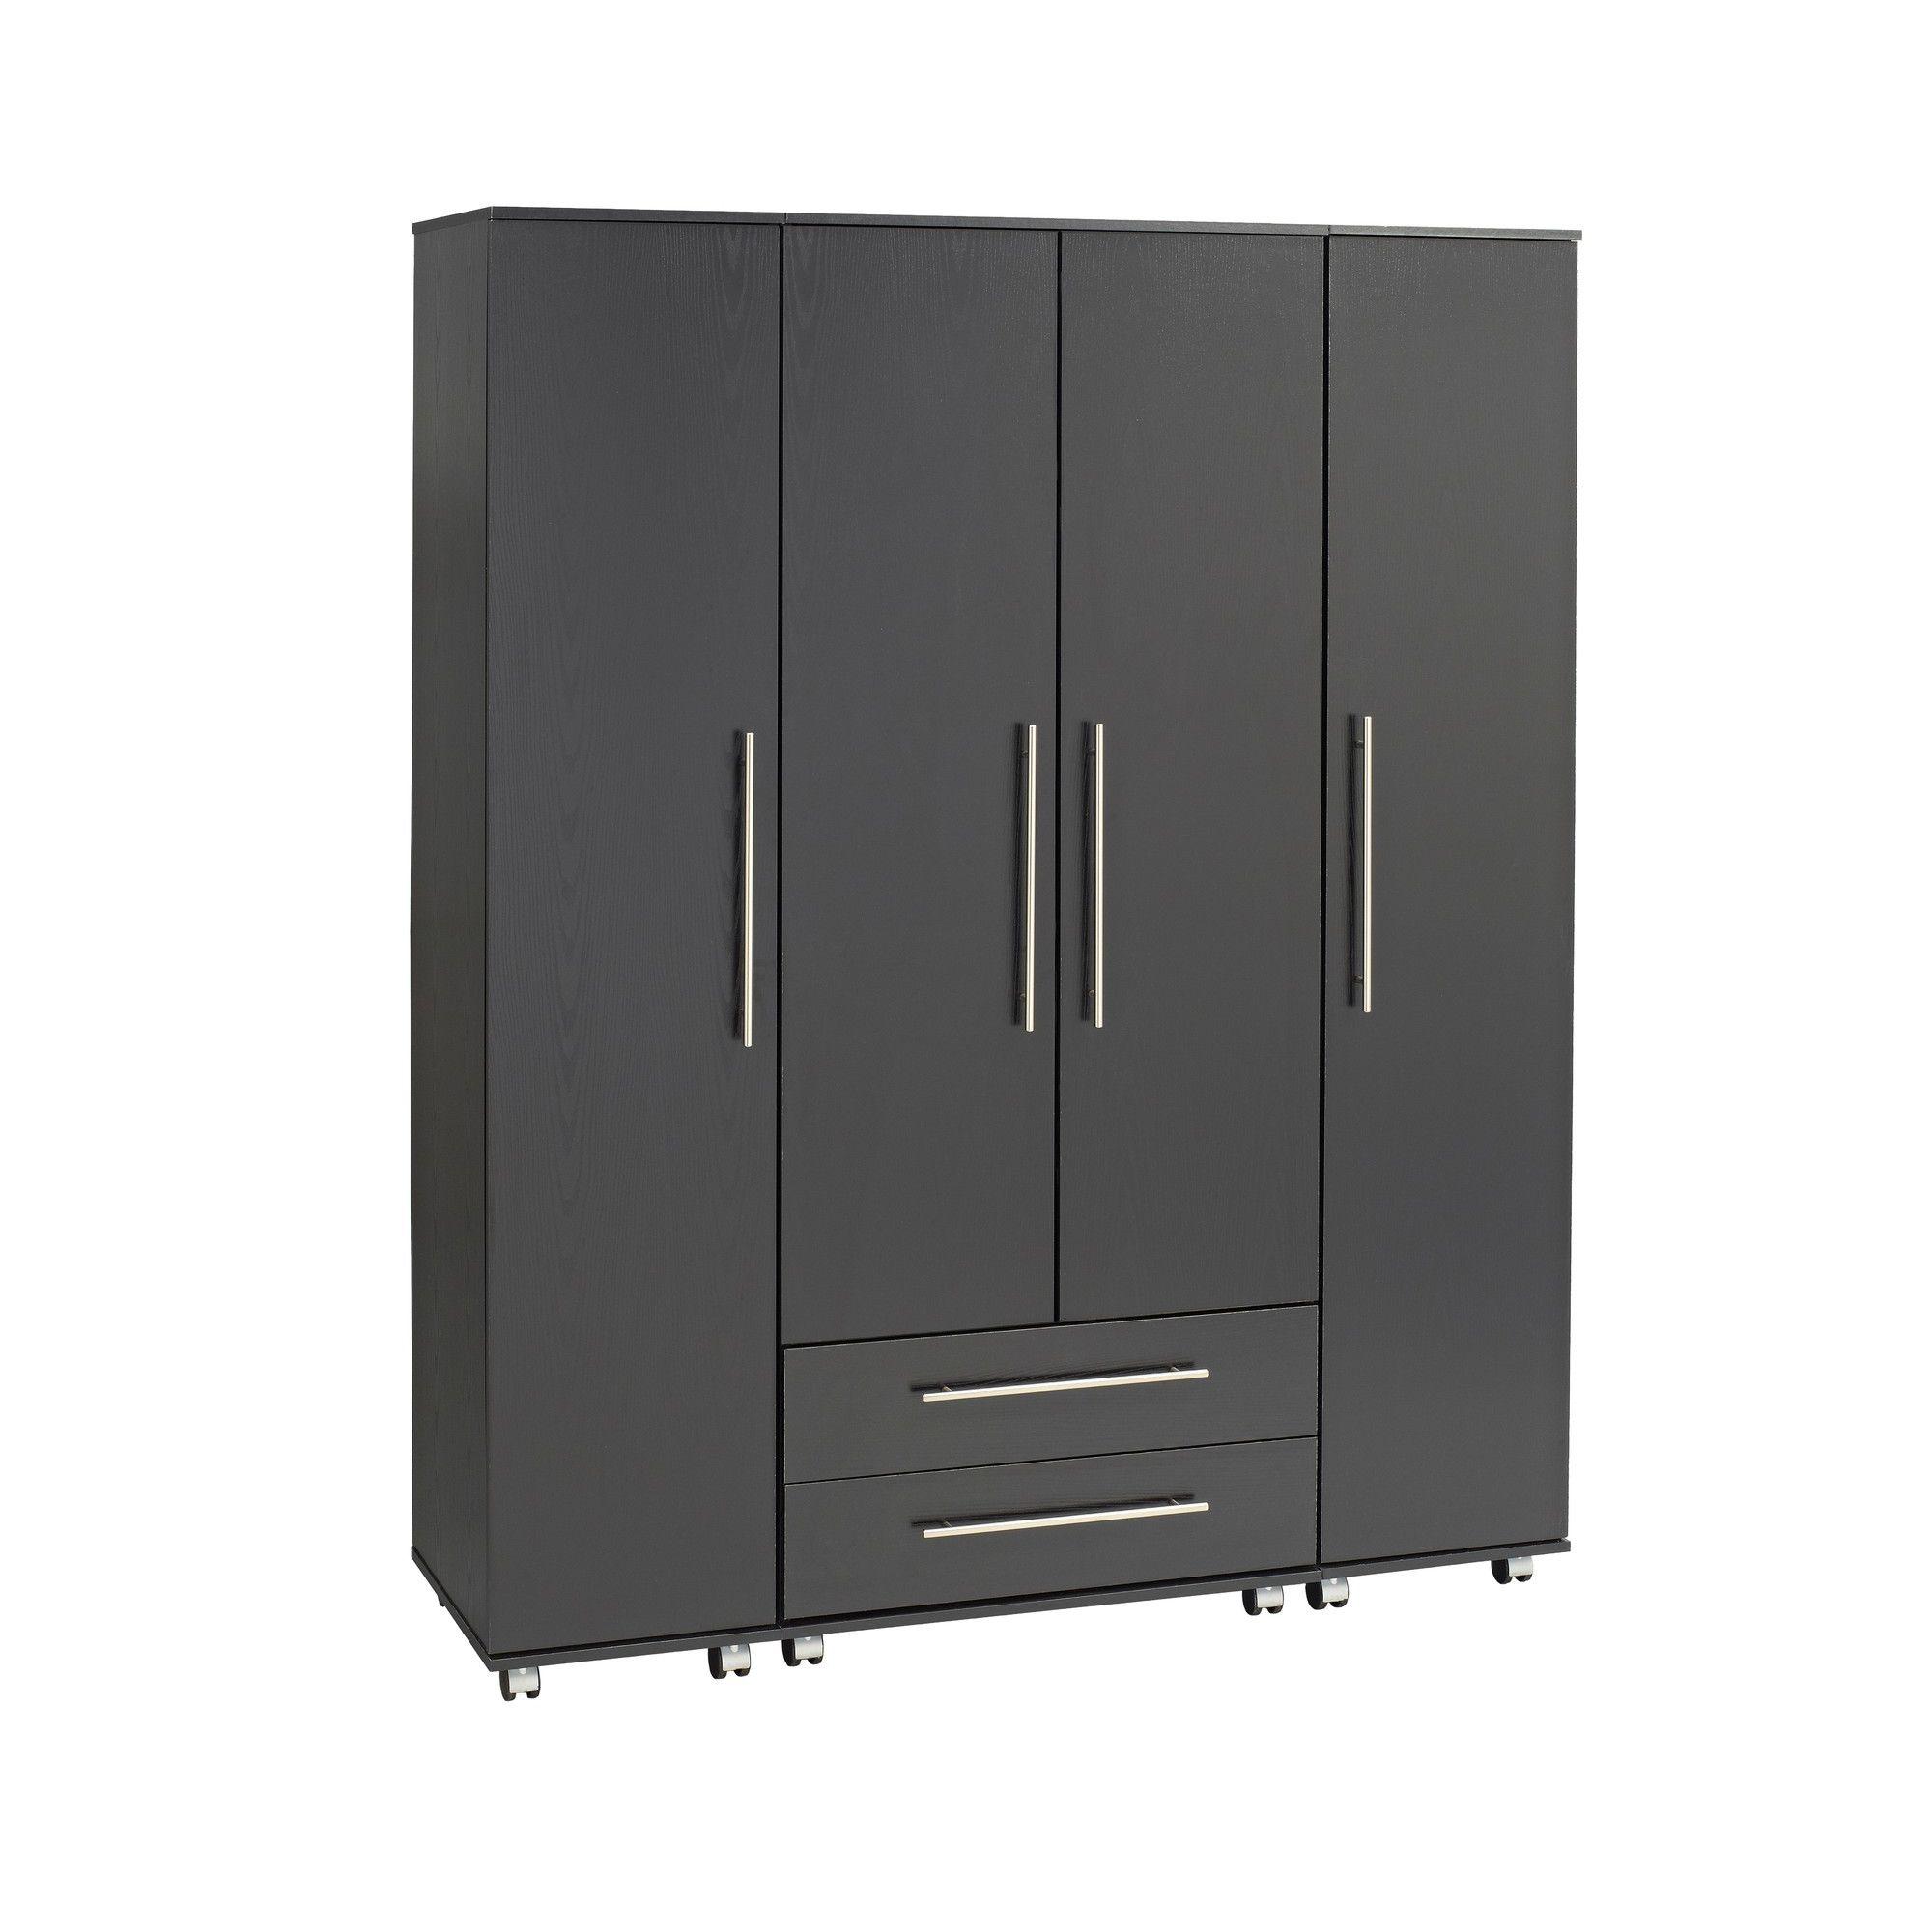 Ideal Furniture Bobby 4 Door Wardrobe - Walnut at Tesco Direct